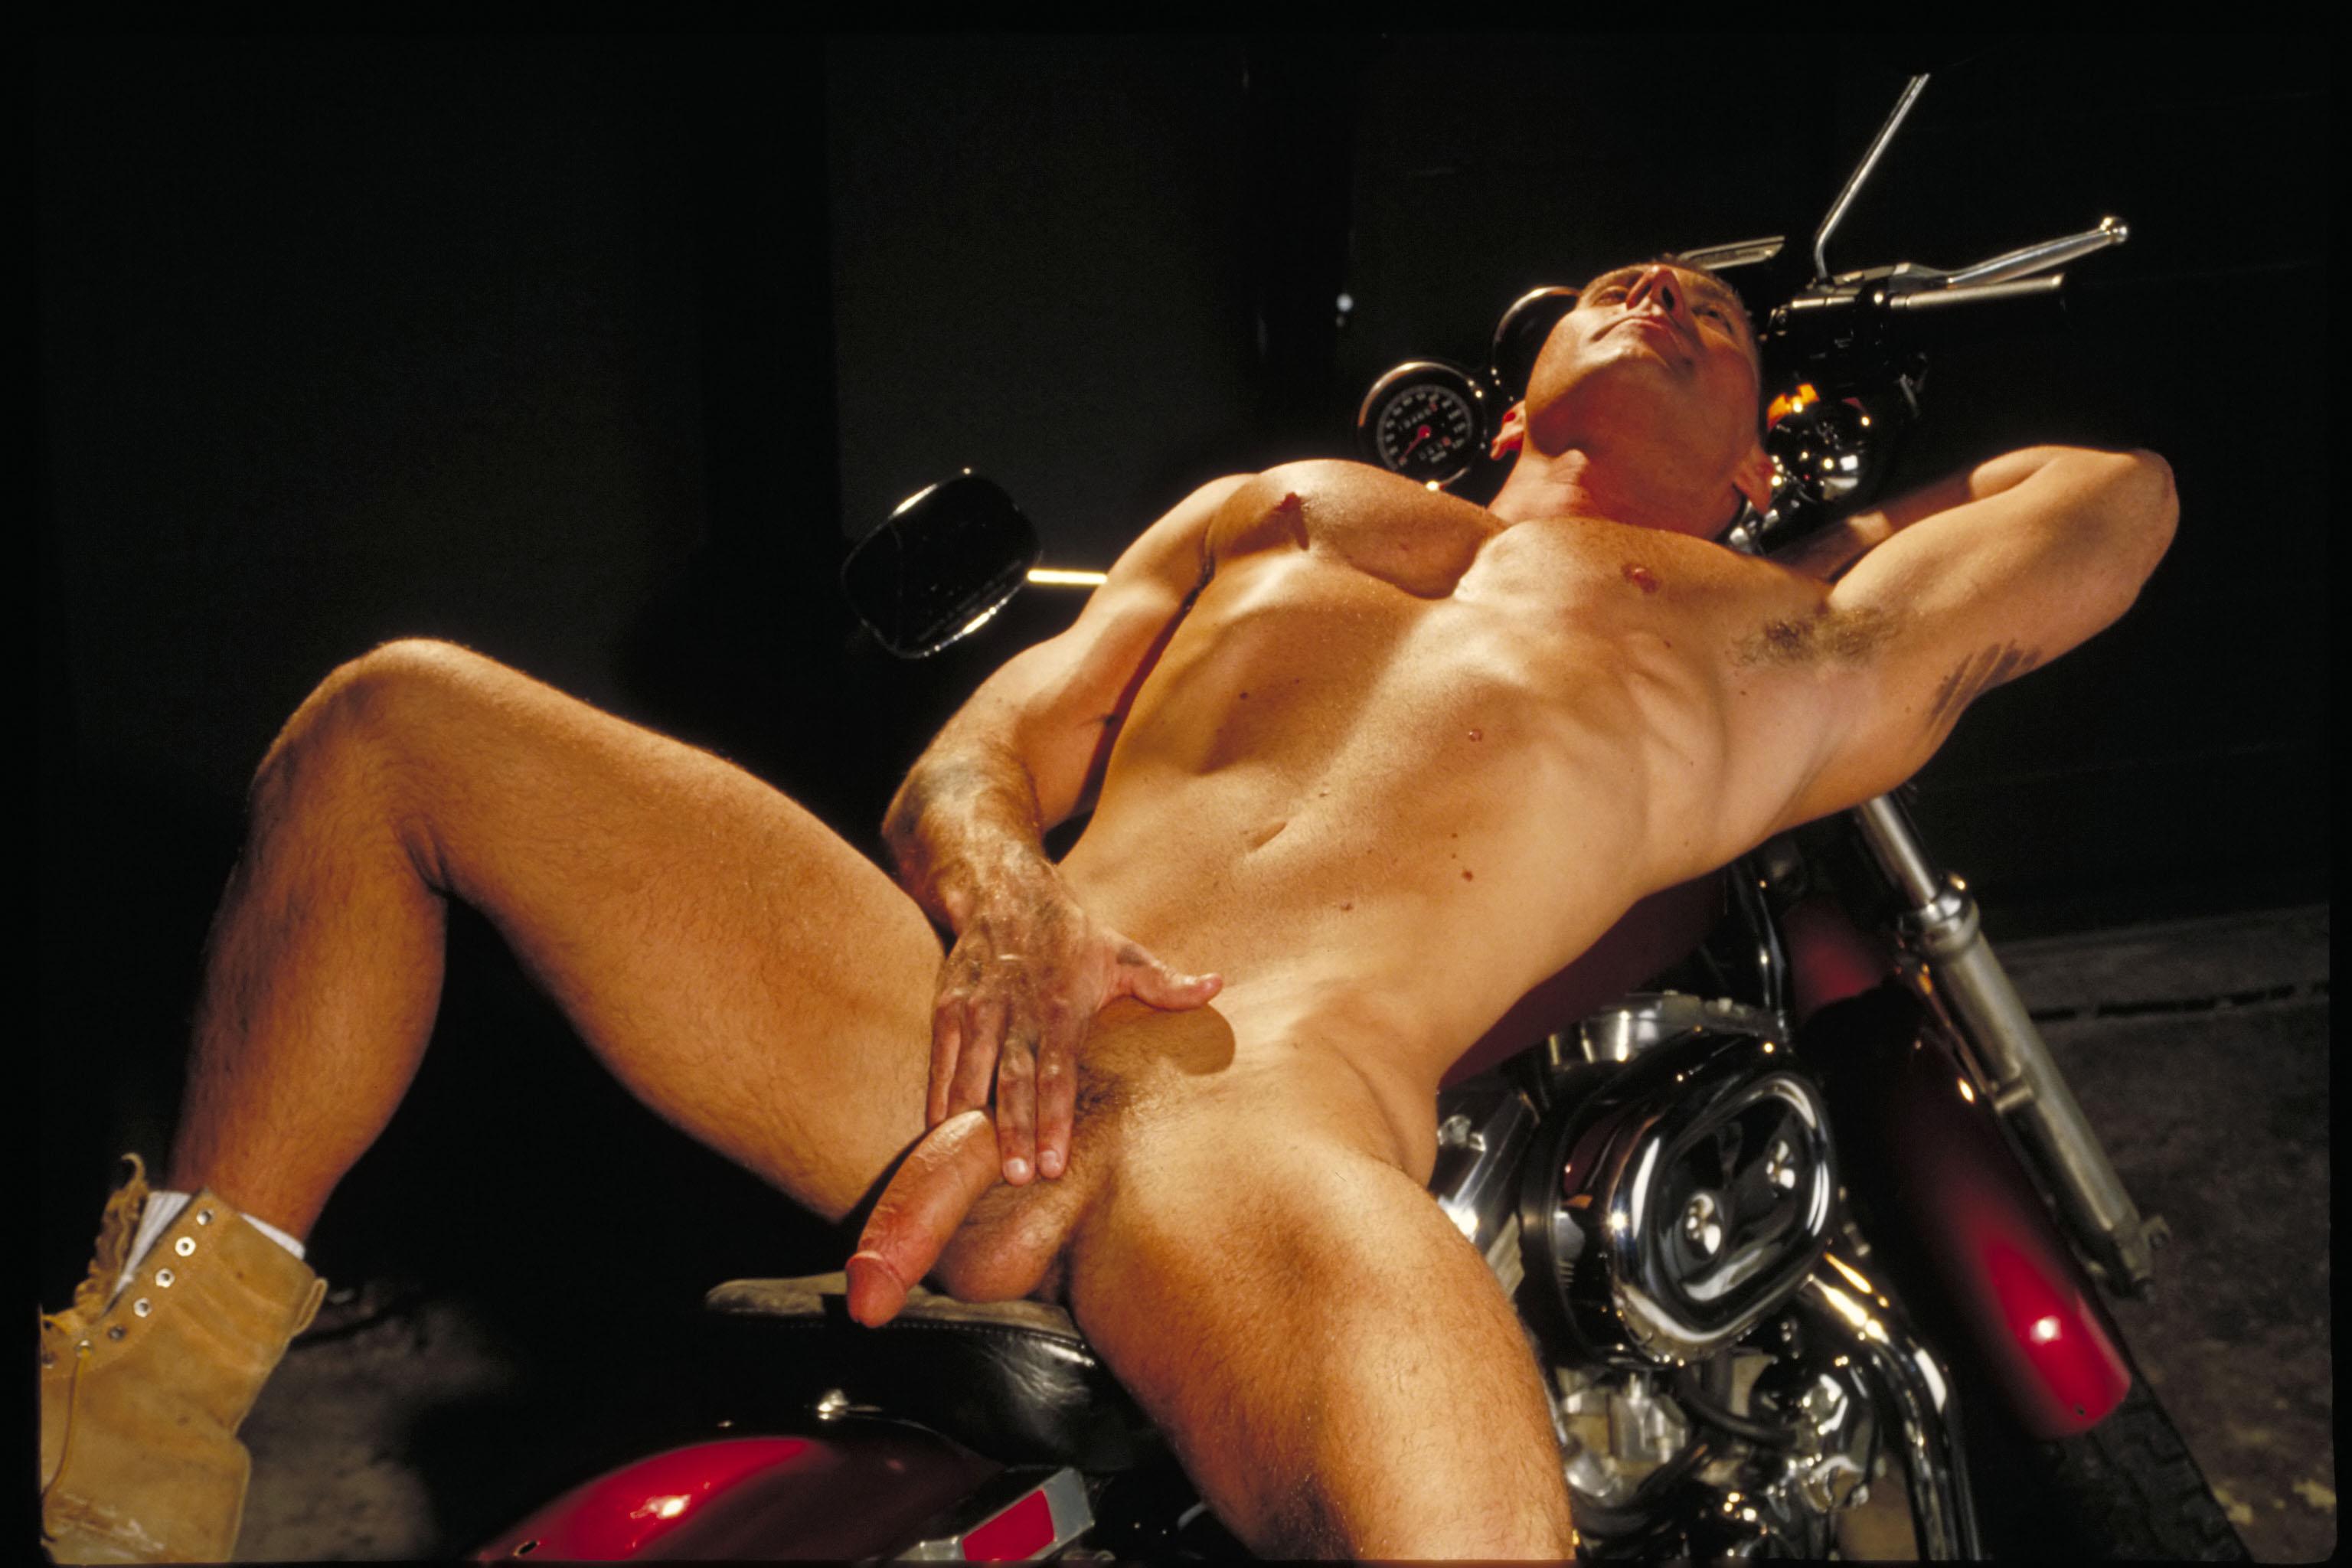 Bondage gay porn category